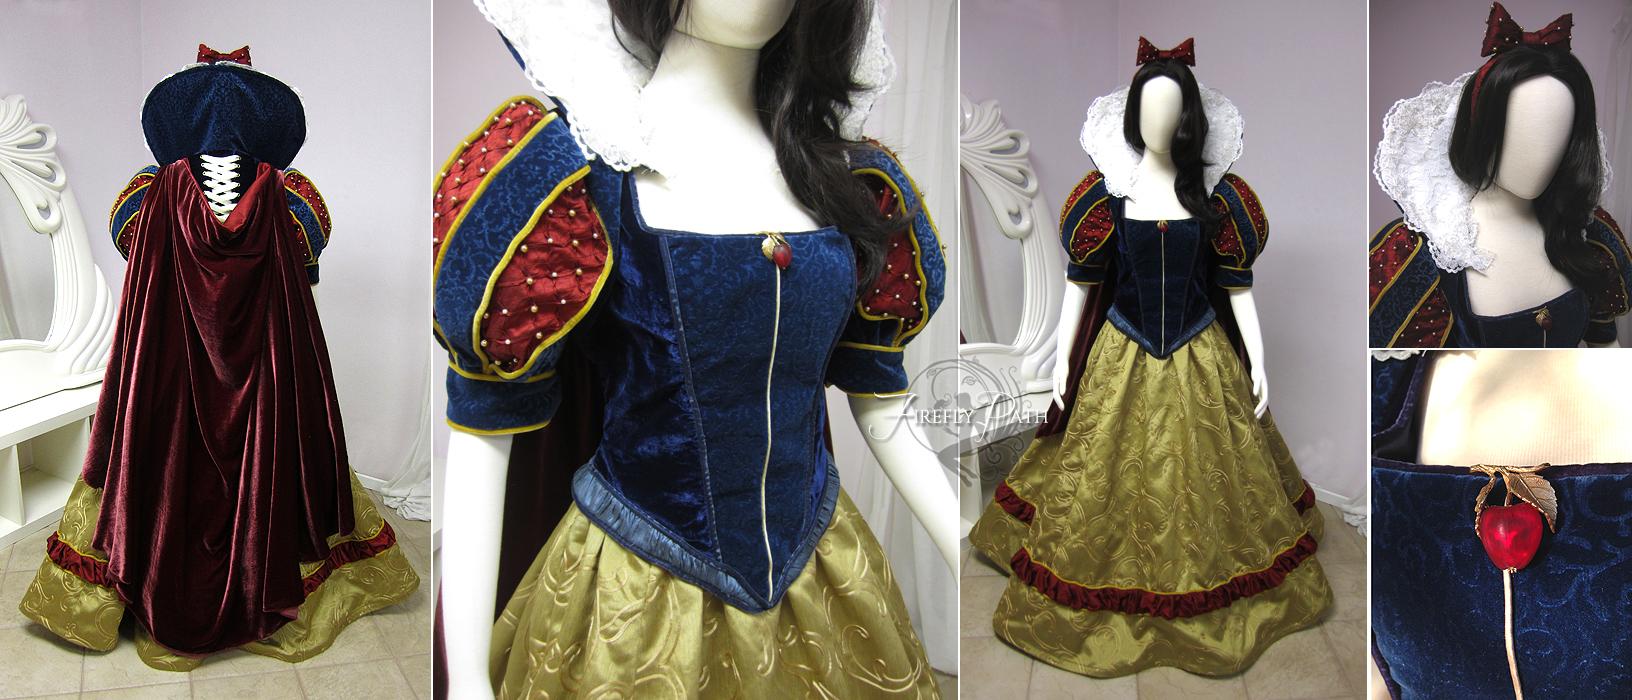 Snow White Dress by Lillyxandra